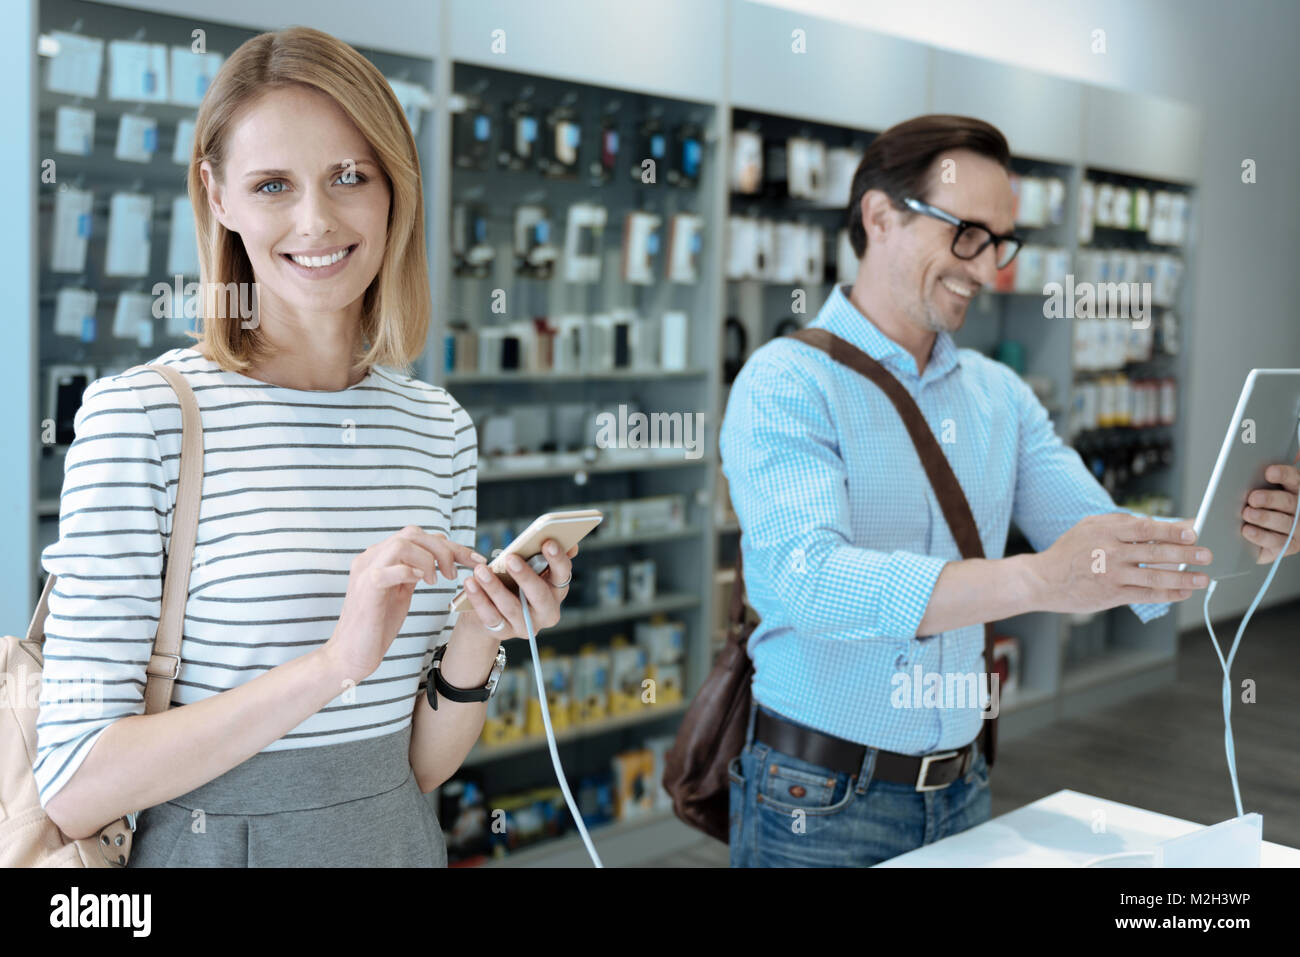 Amazing female vising new store - Stock Image